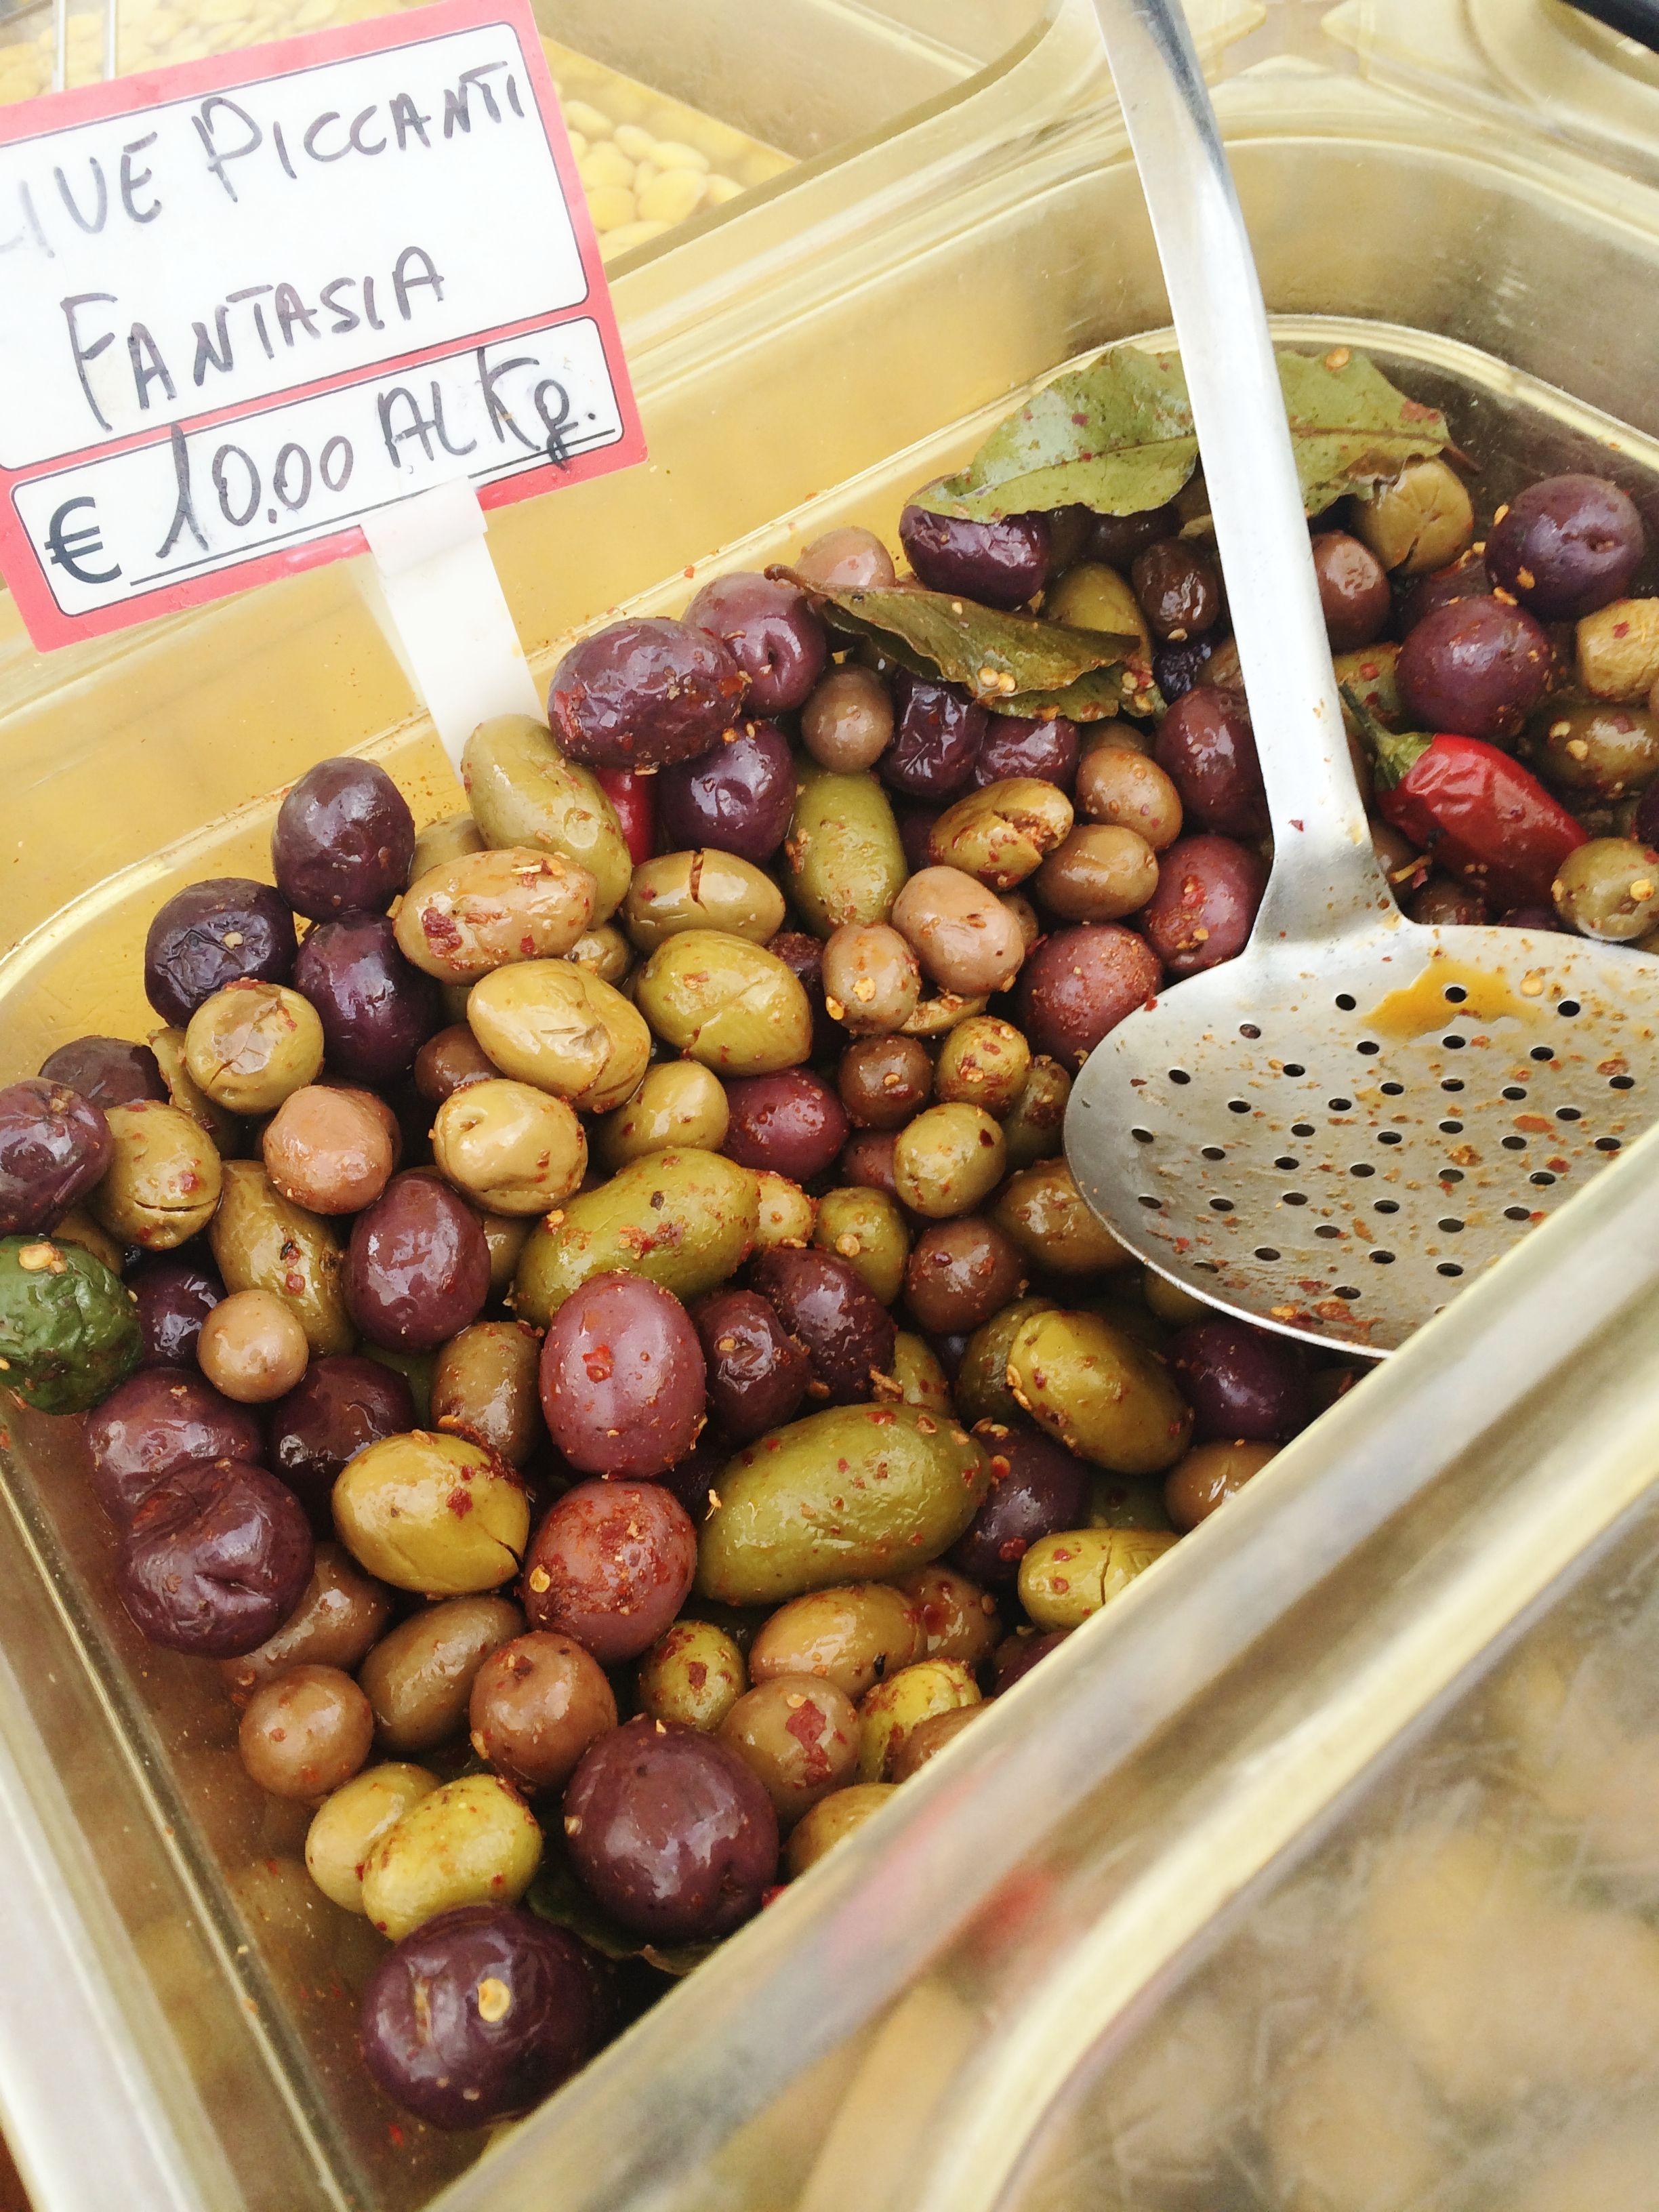 alberobello, puglia, italy // olives in the market | italy ...